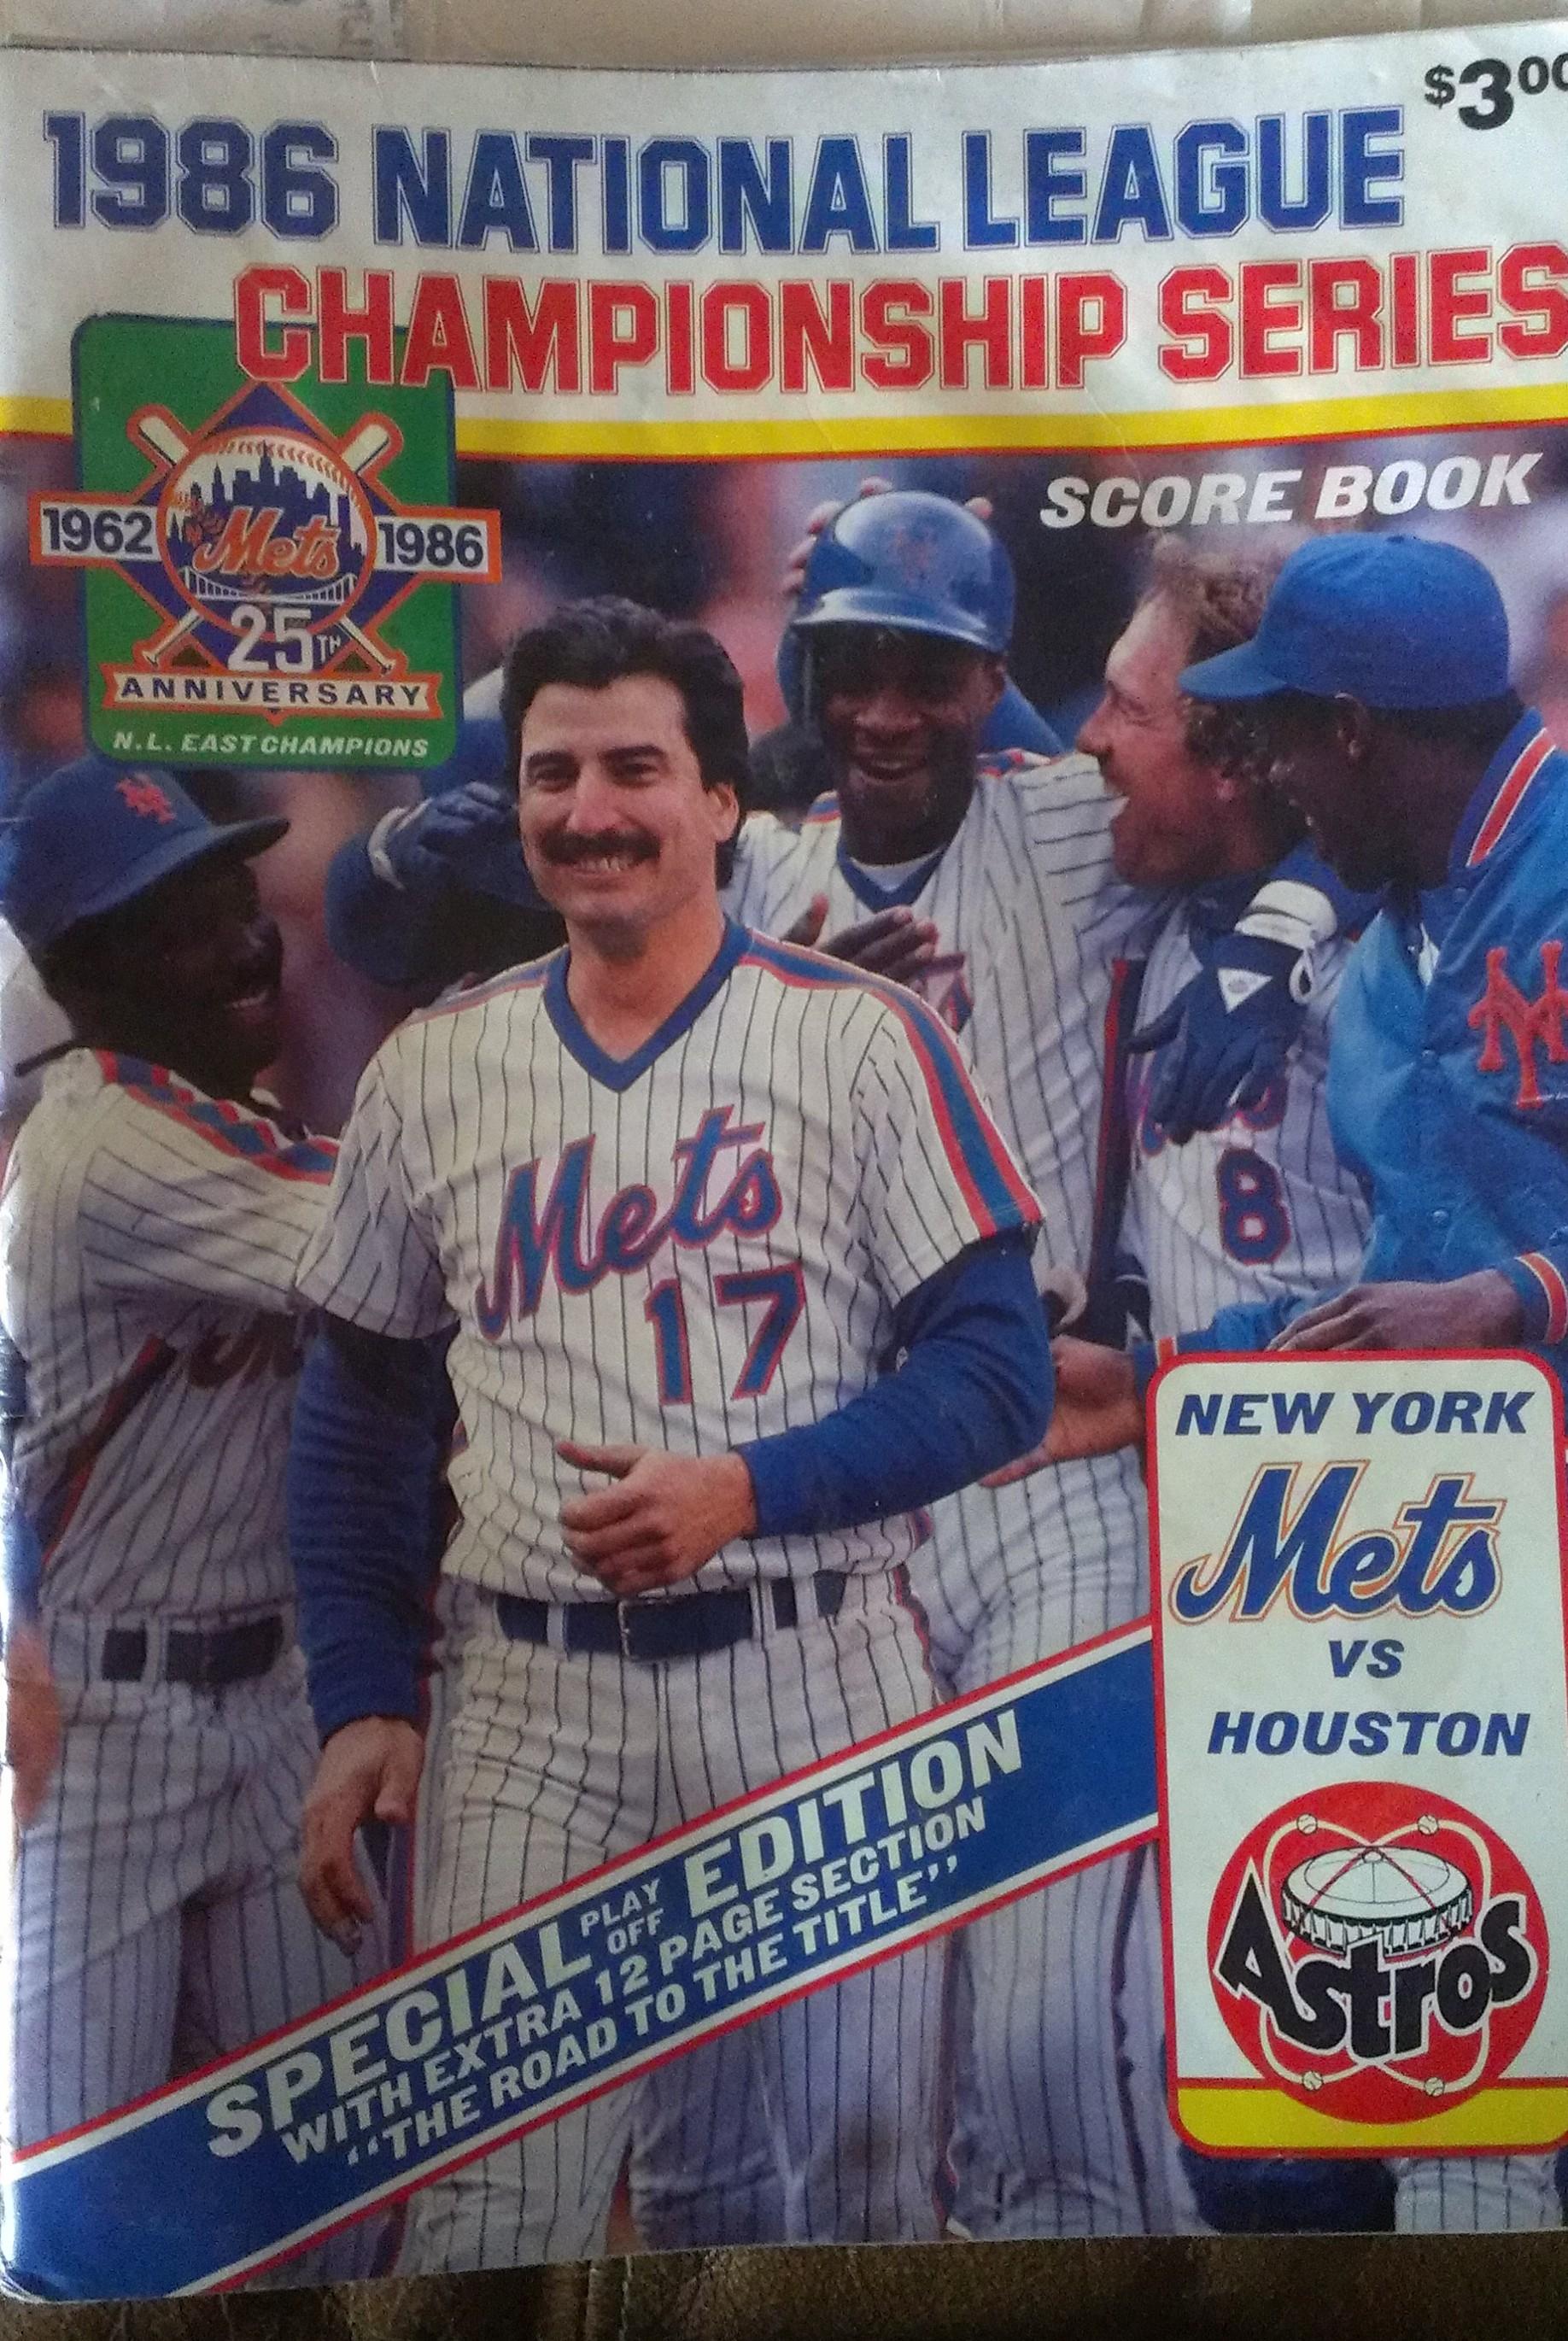 1986 NLCS score book